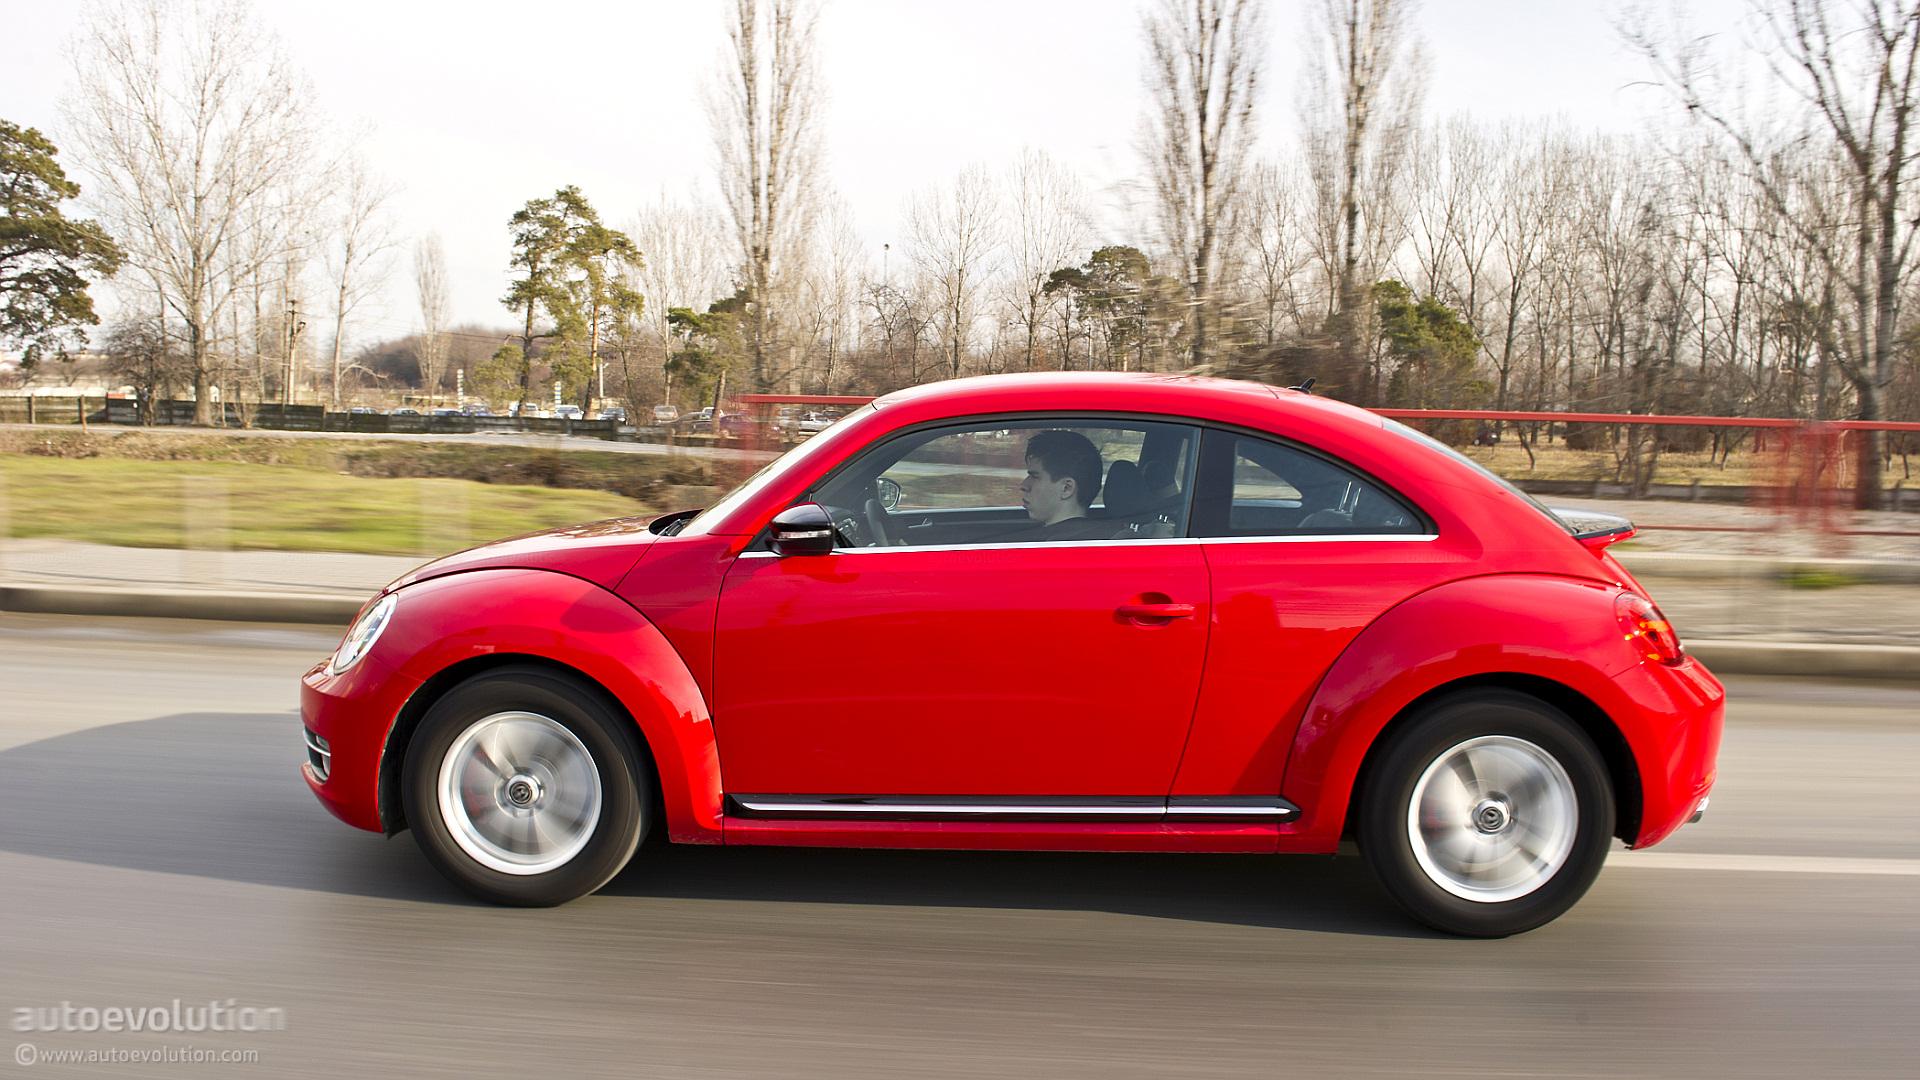 vw beetle review autoevolution. Black Bedroom Furniture Sets. Home Design Ideas